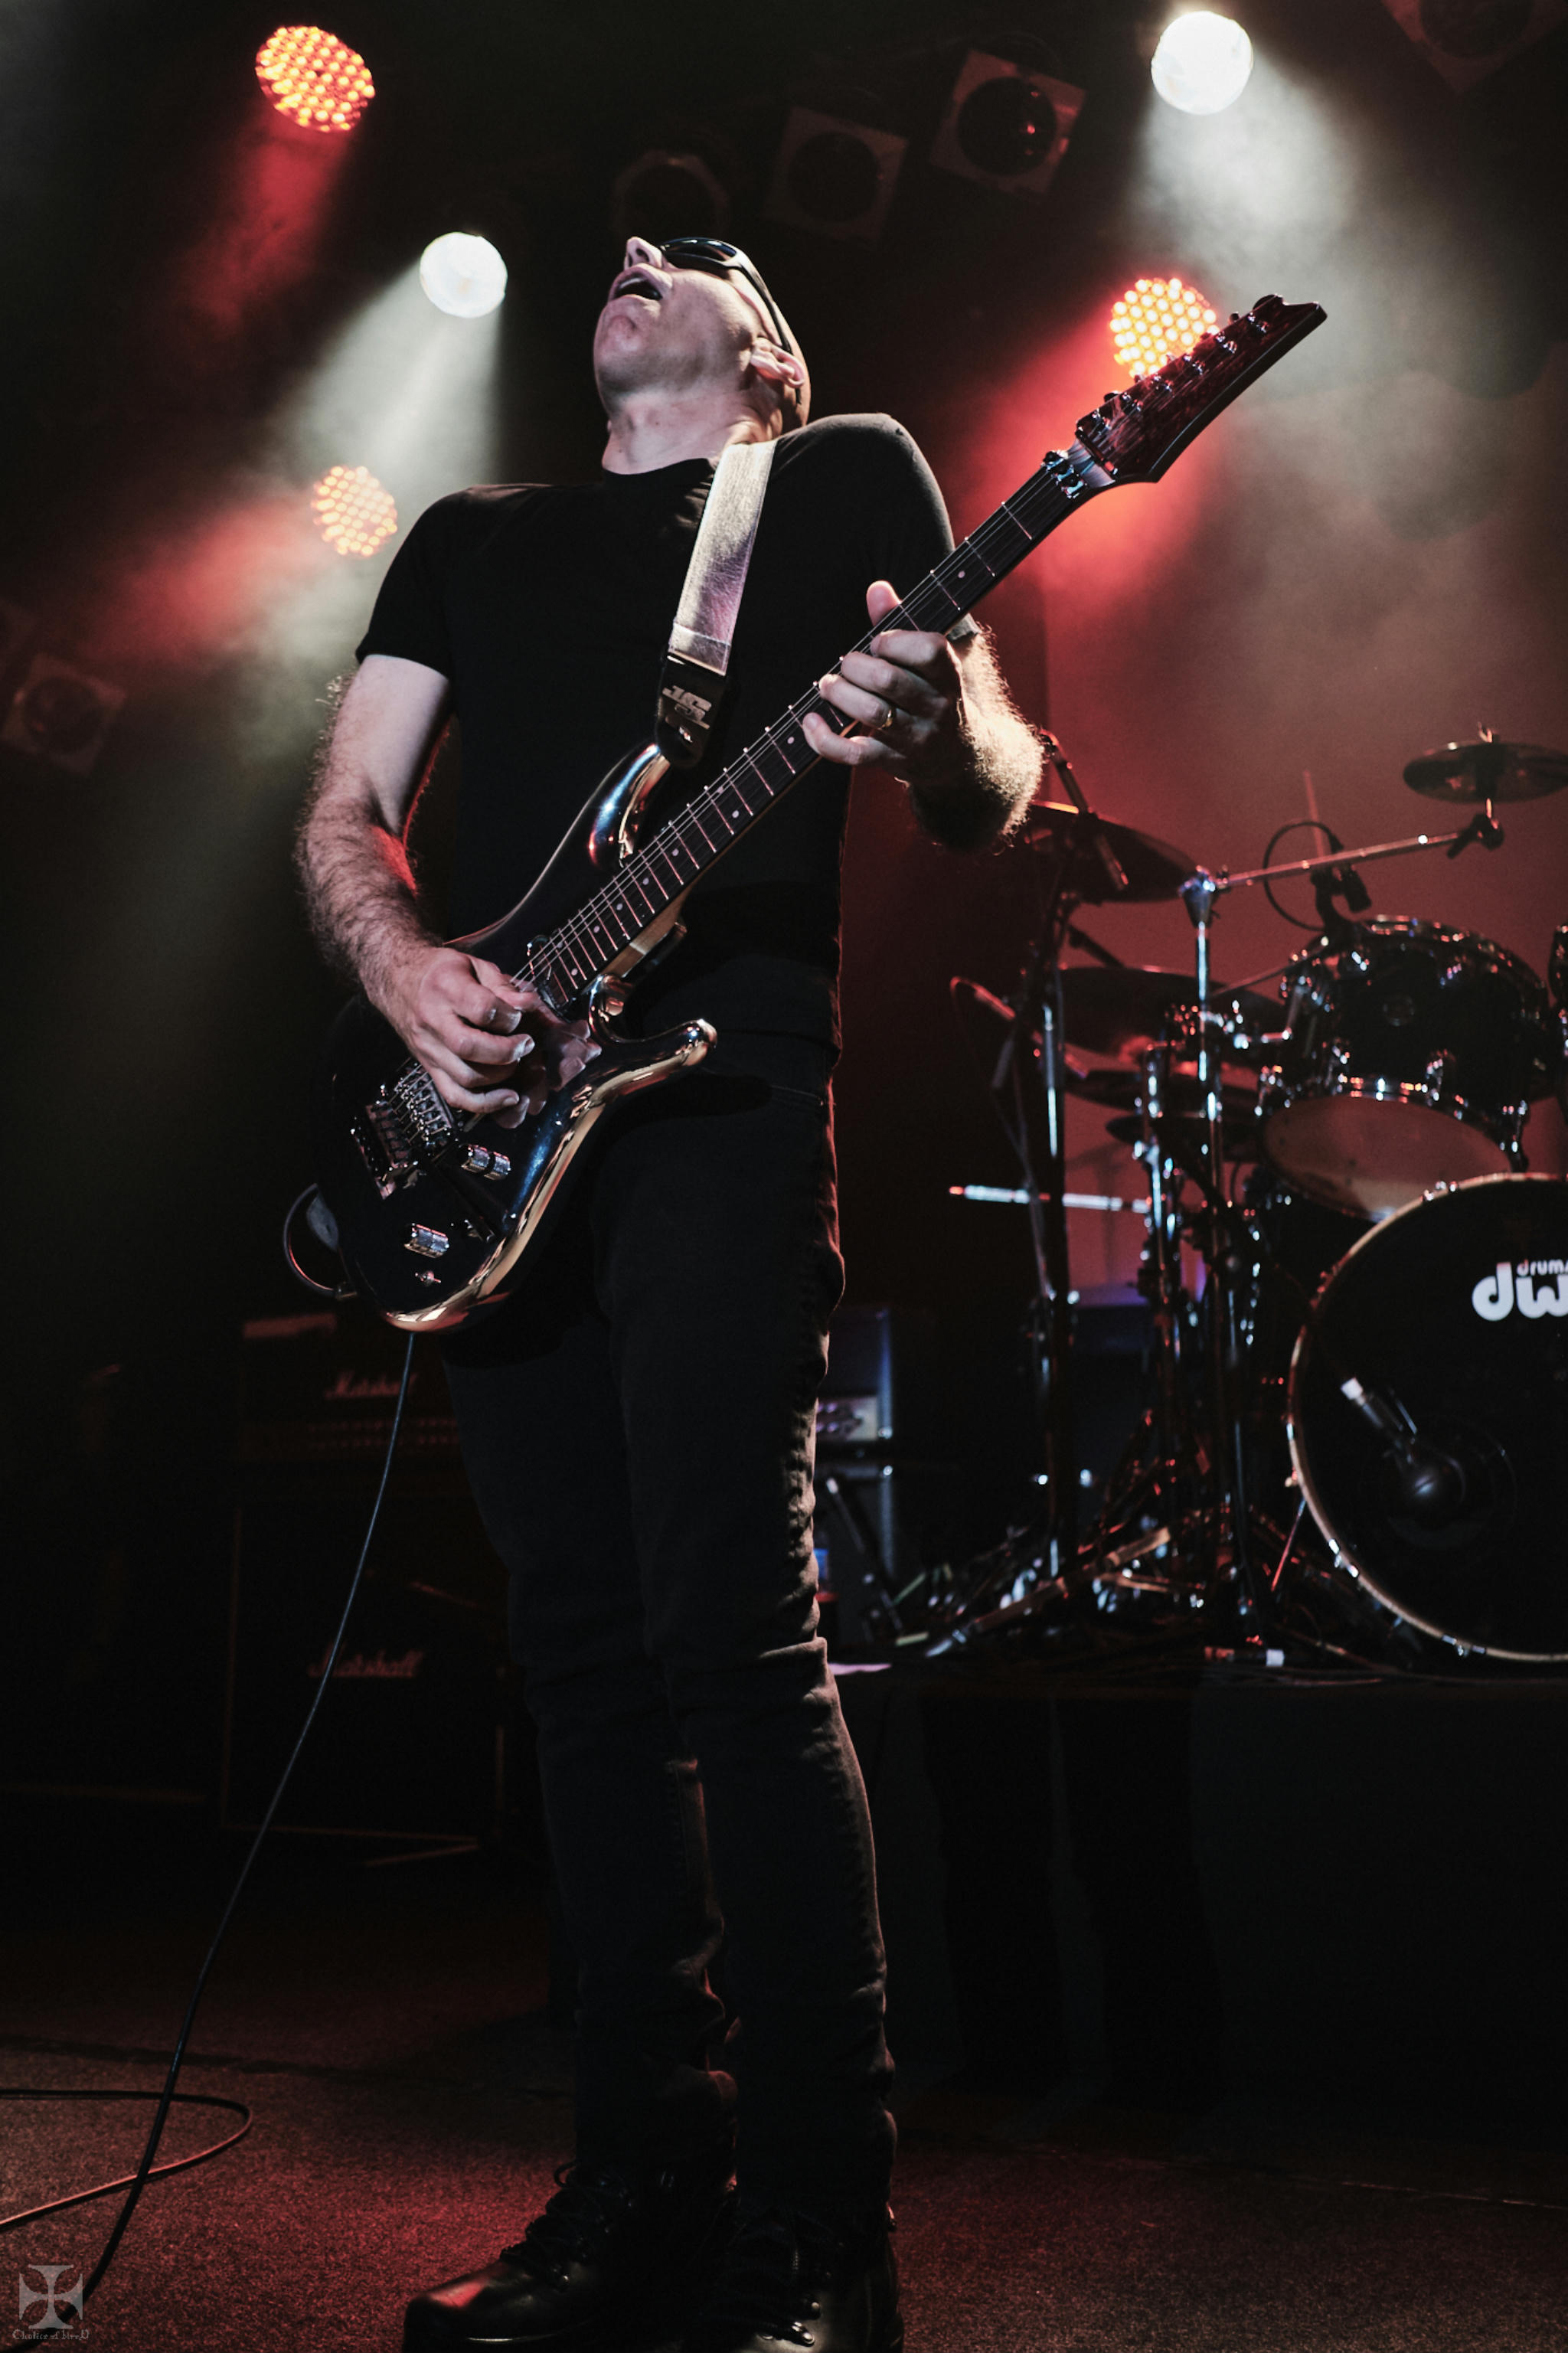 2018.12.04 Joe Satriani - DSC21461_branded.jpg